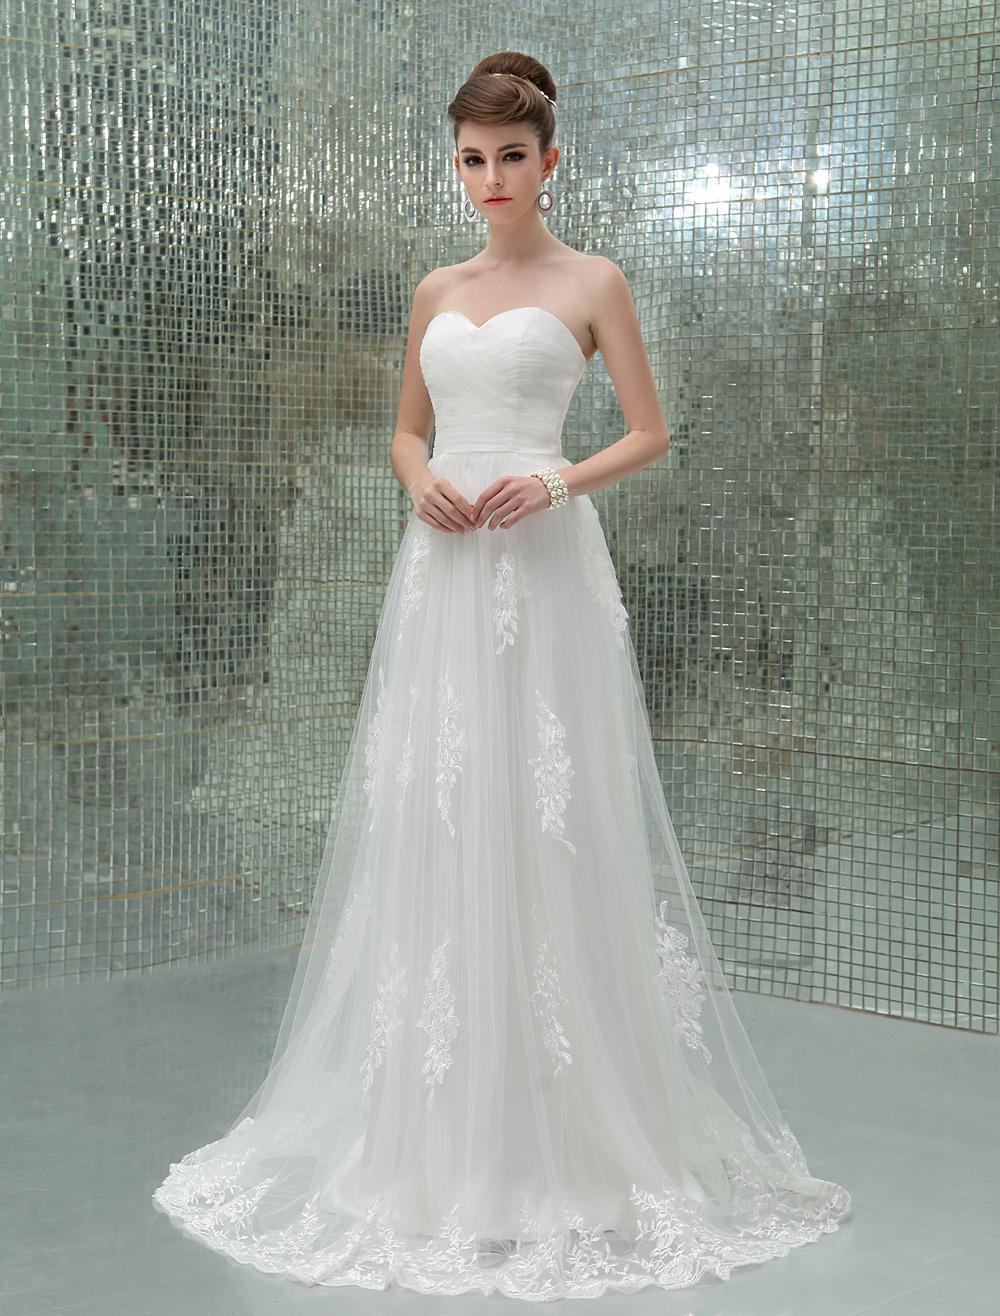 Floor-Length Ivory Strapless Applique Wedding Dress